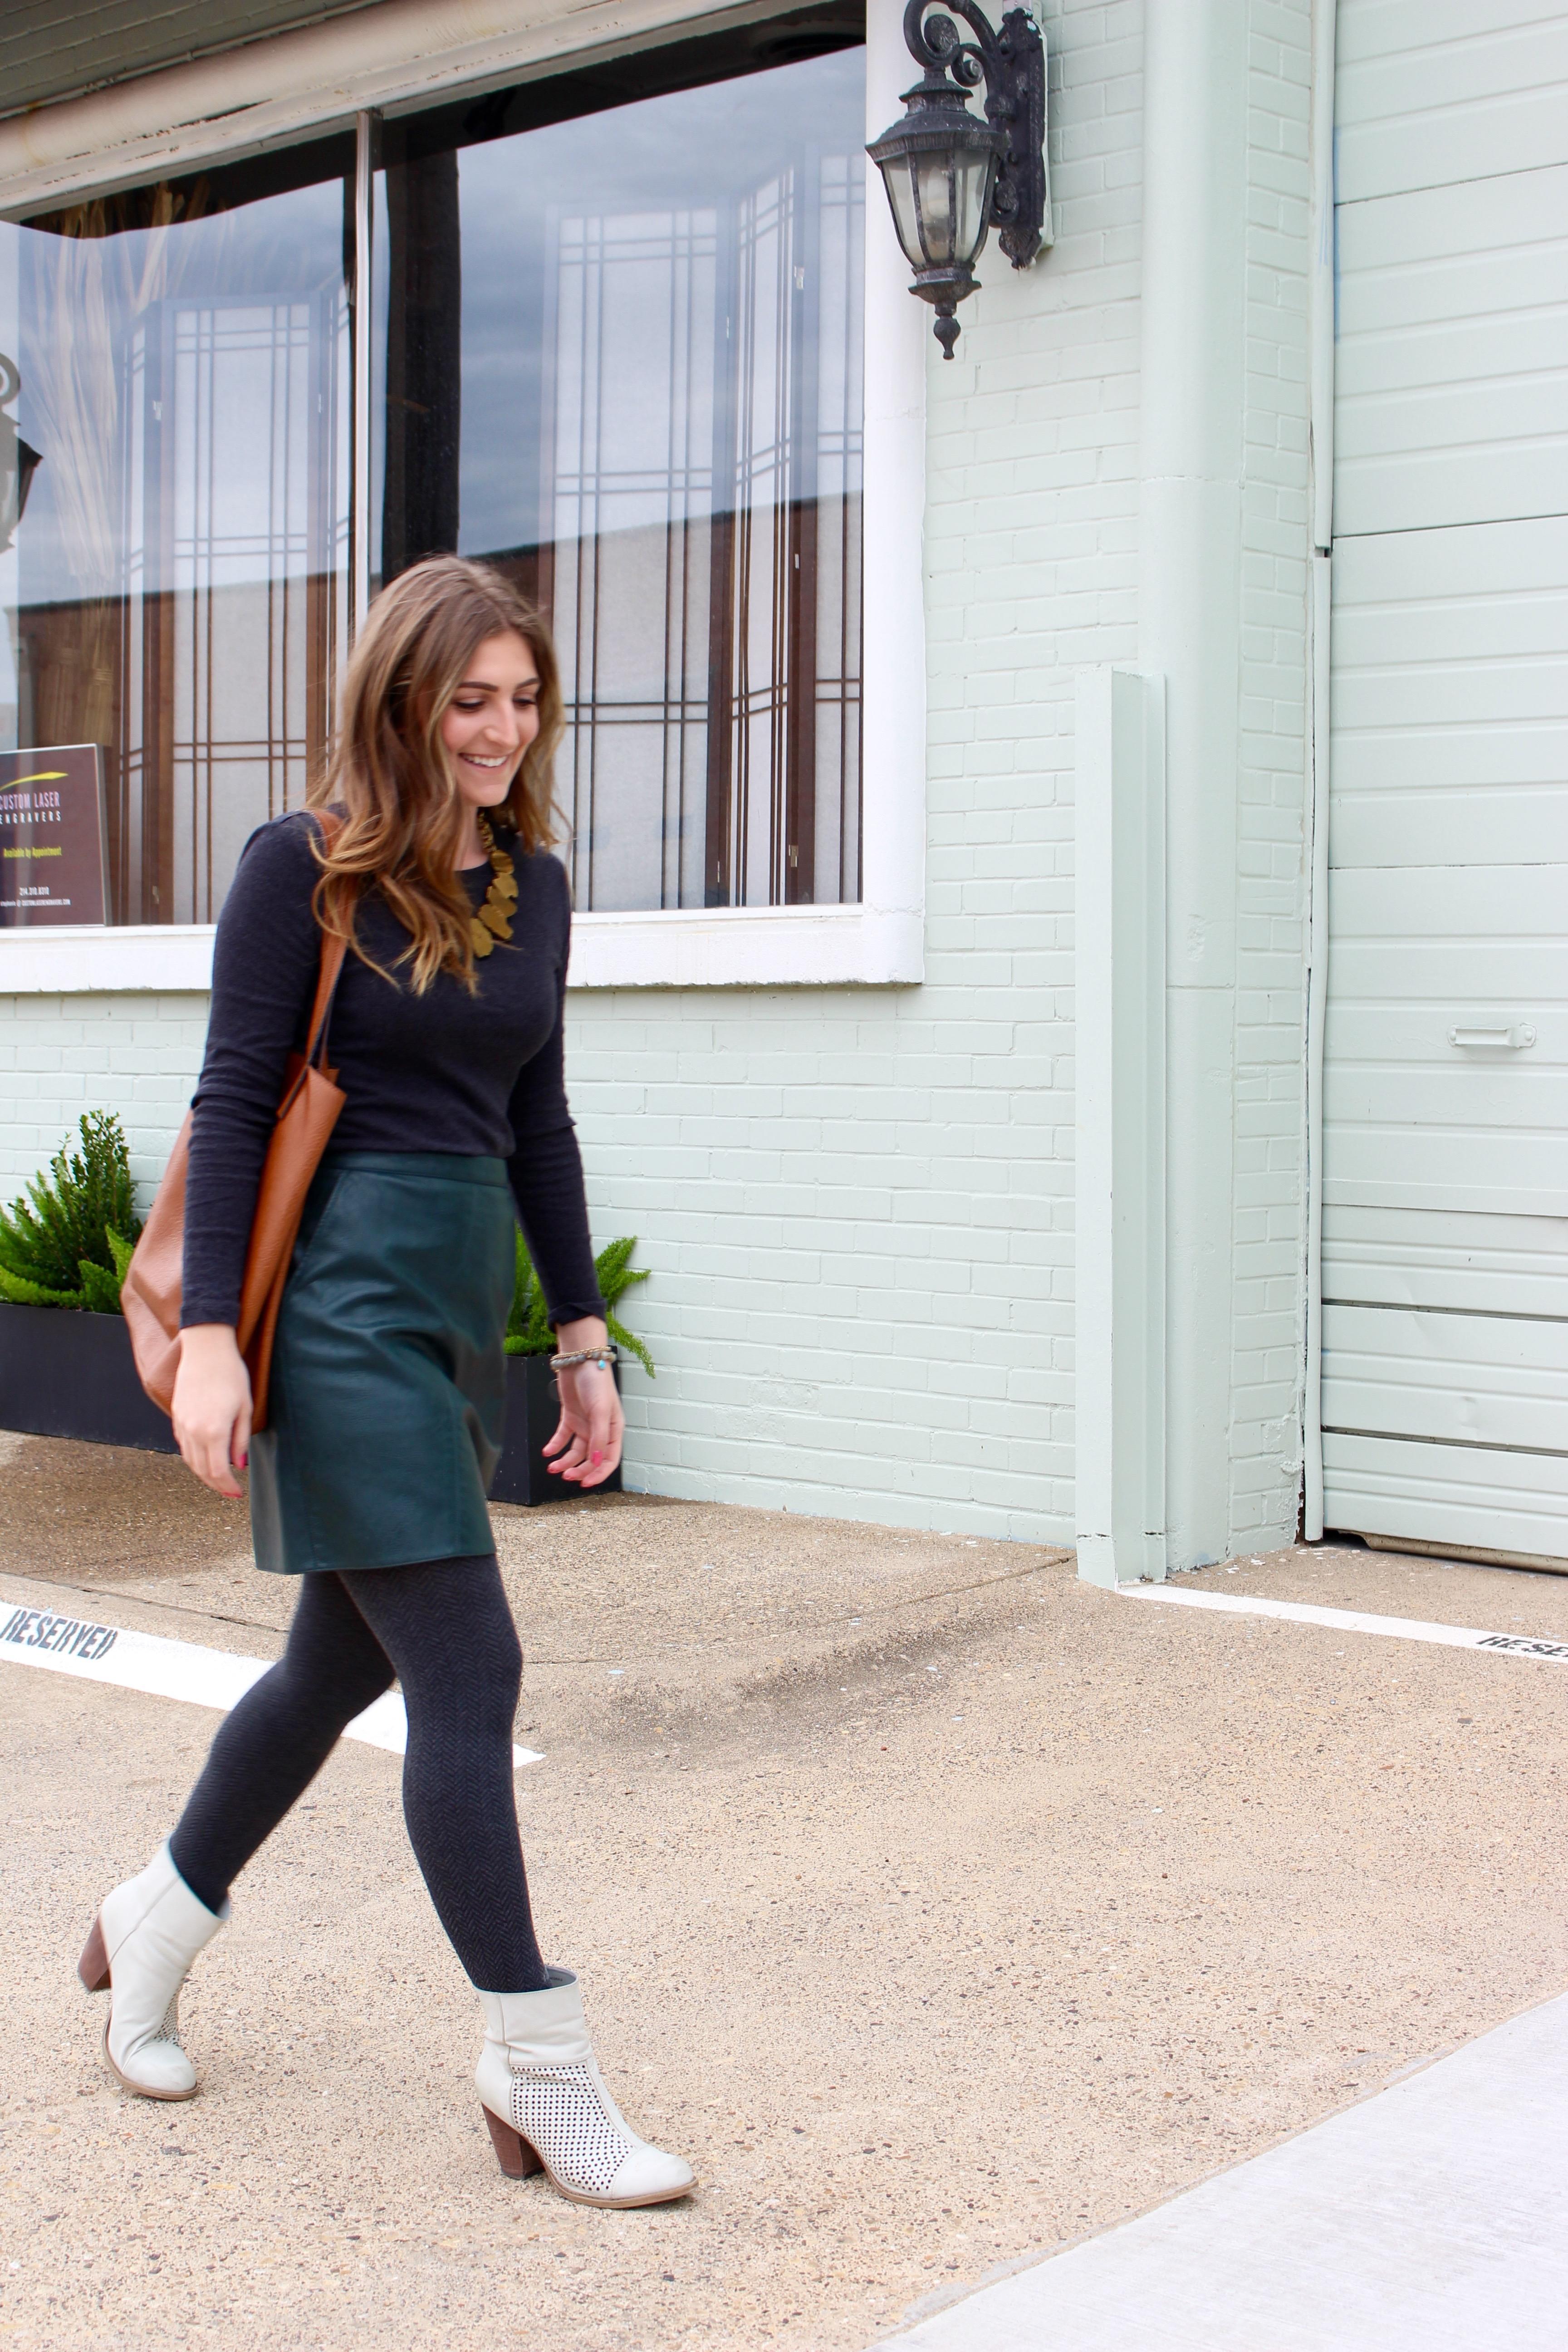 walking in dallas in a green leather skirt